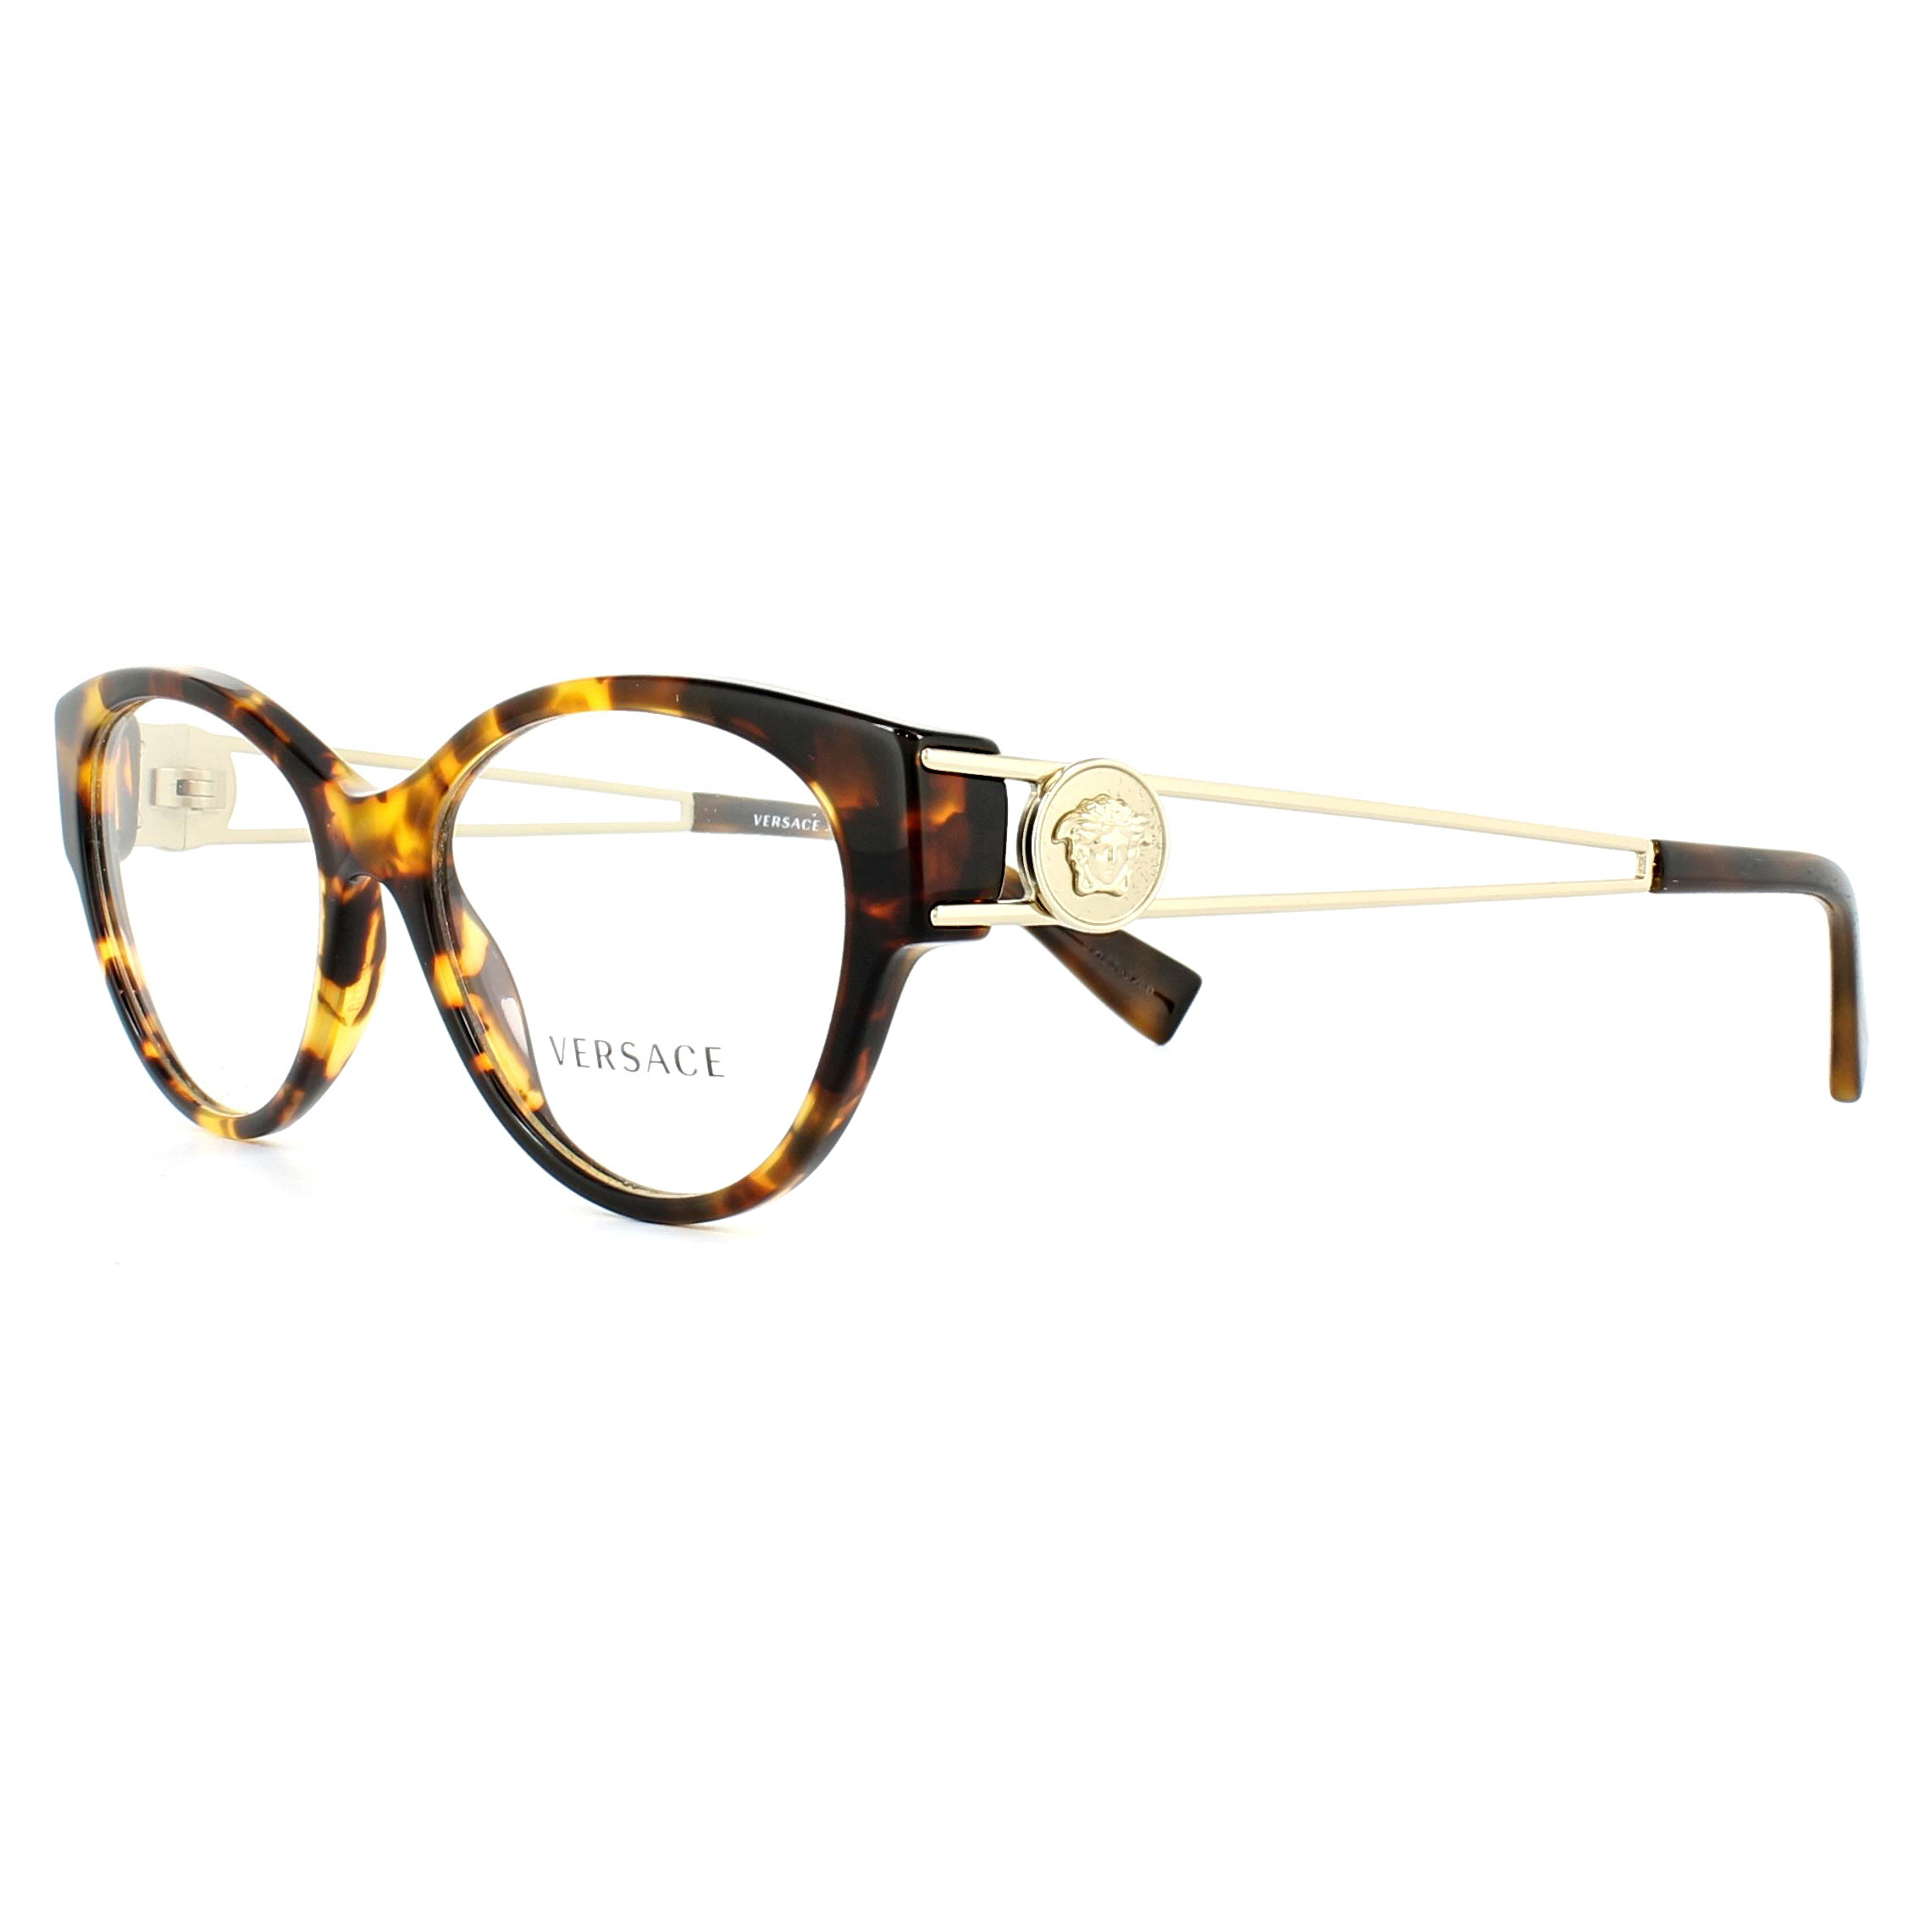 48a0c3e9f6 Versace Glasses Frames 3254 5148 Havana 54mm Womens 8053672799873